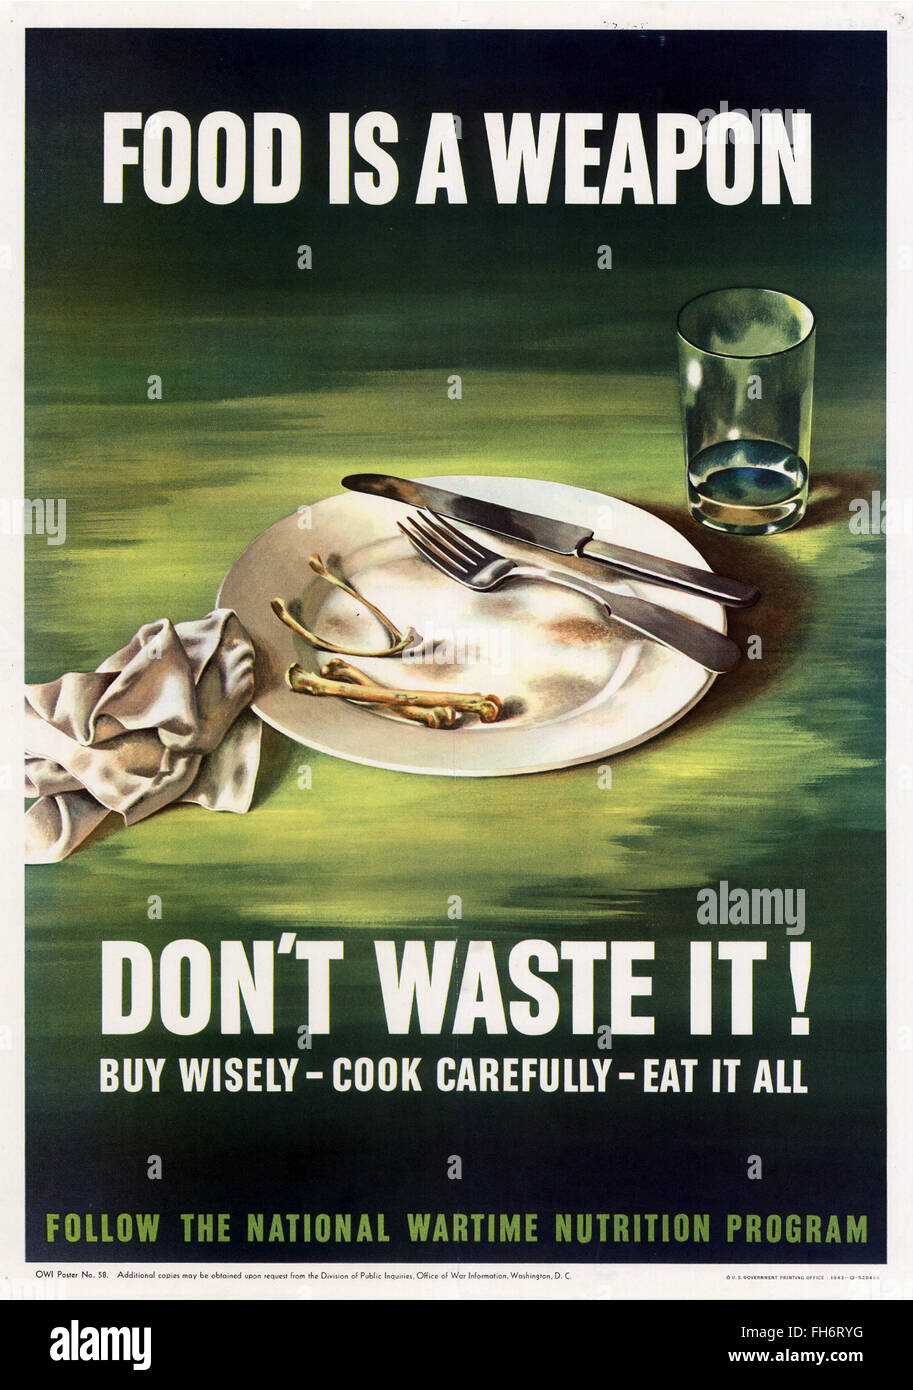 Rationierung des Futters ist eine Waffe - uns Propaganda-Plakat - WWII Stockbild